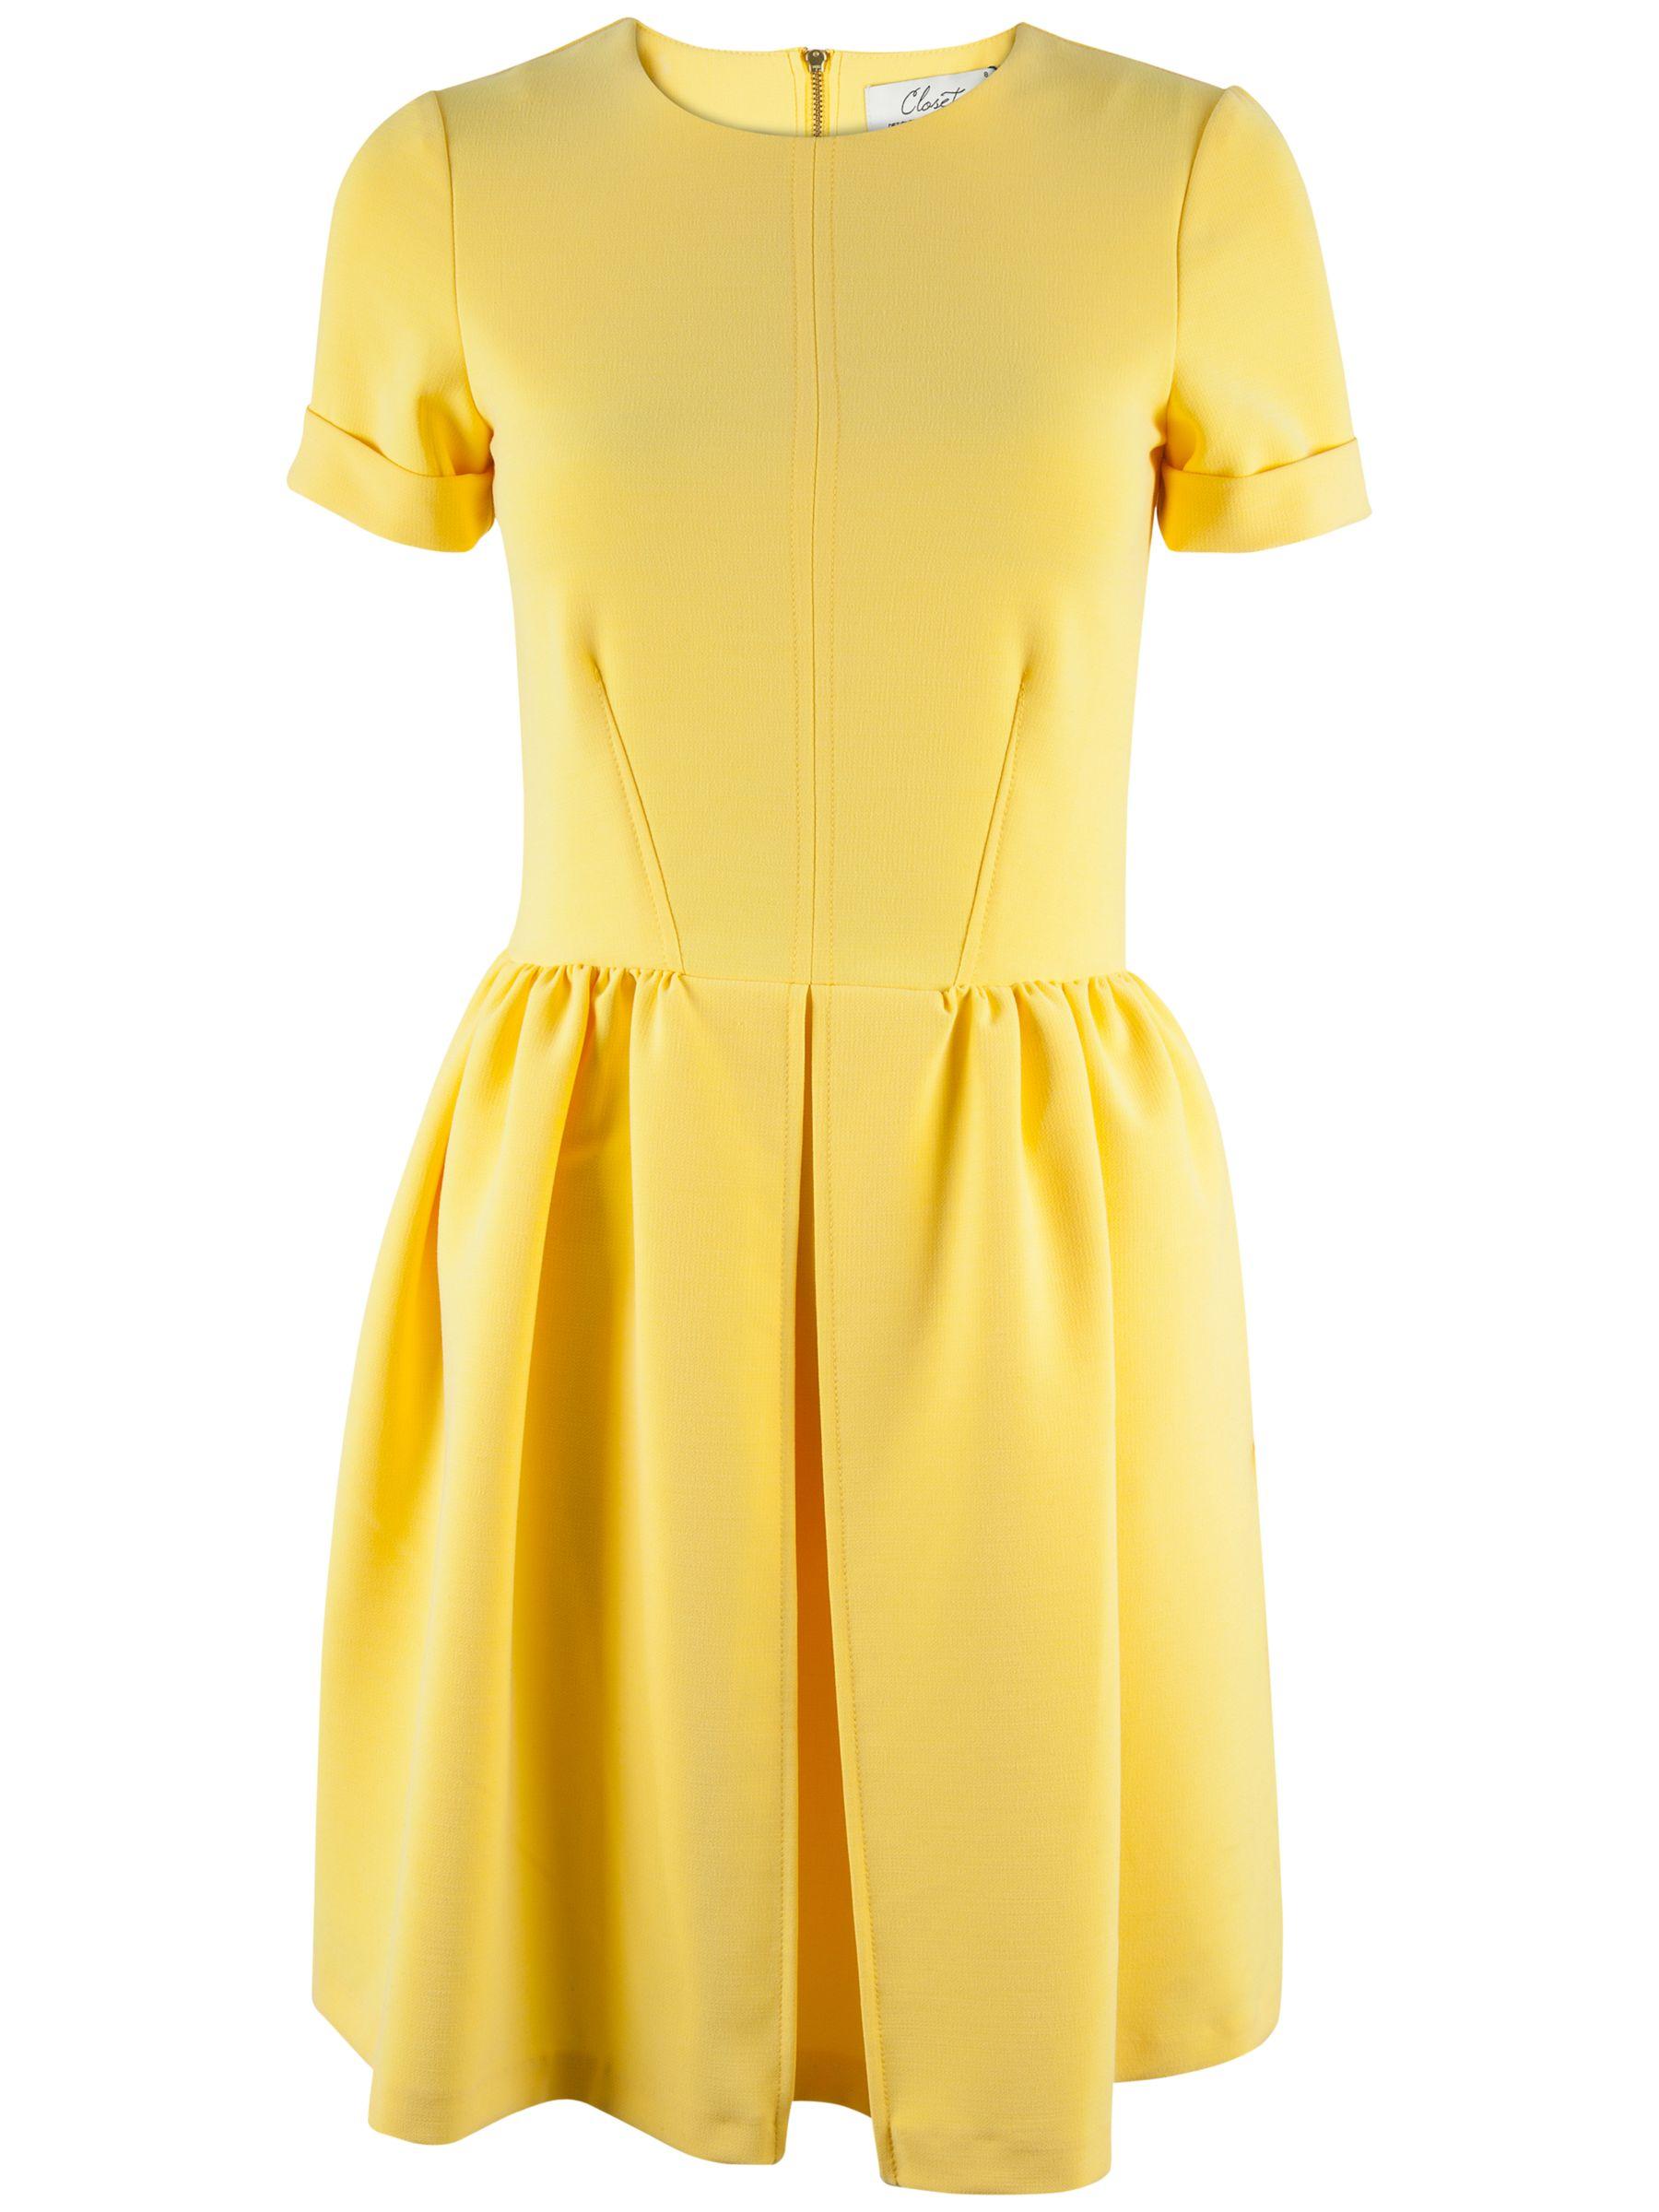 closet vent short sleeve dress yellow, closet, vent, short, sleeve, dress, yellow, 10|14|8|12, women, womens dresses, 1905976